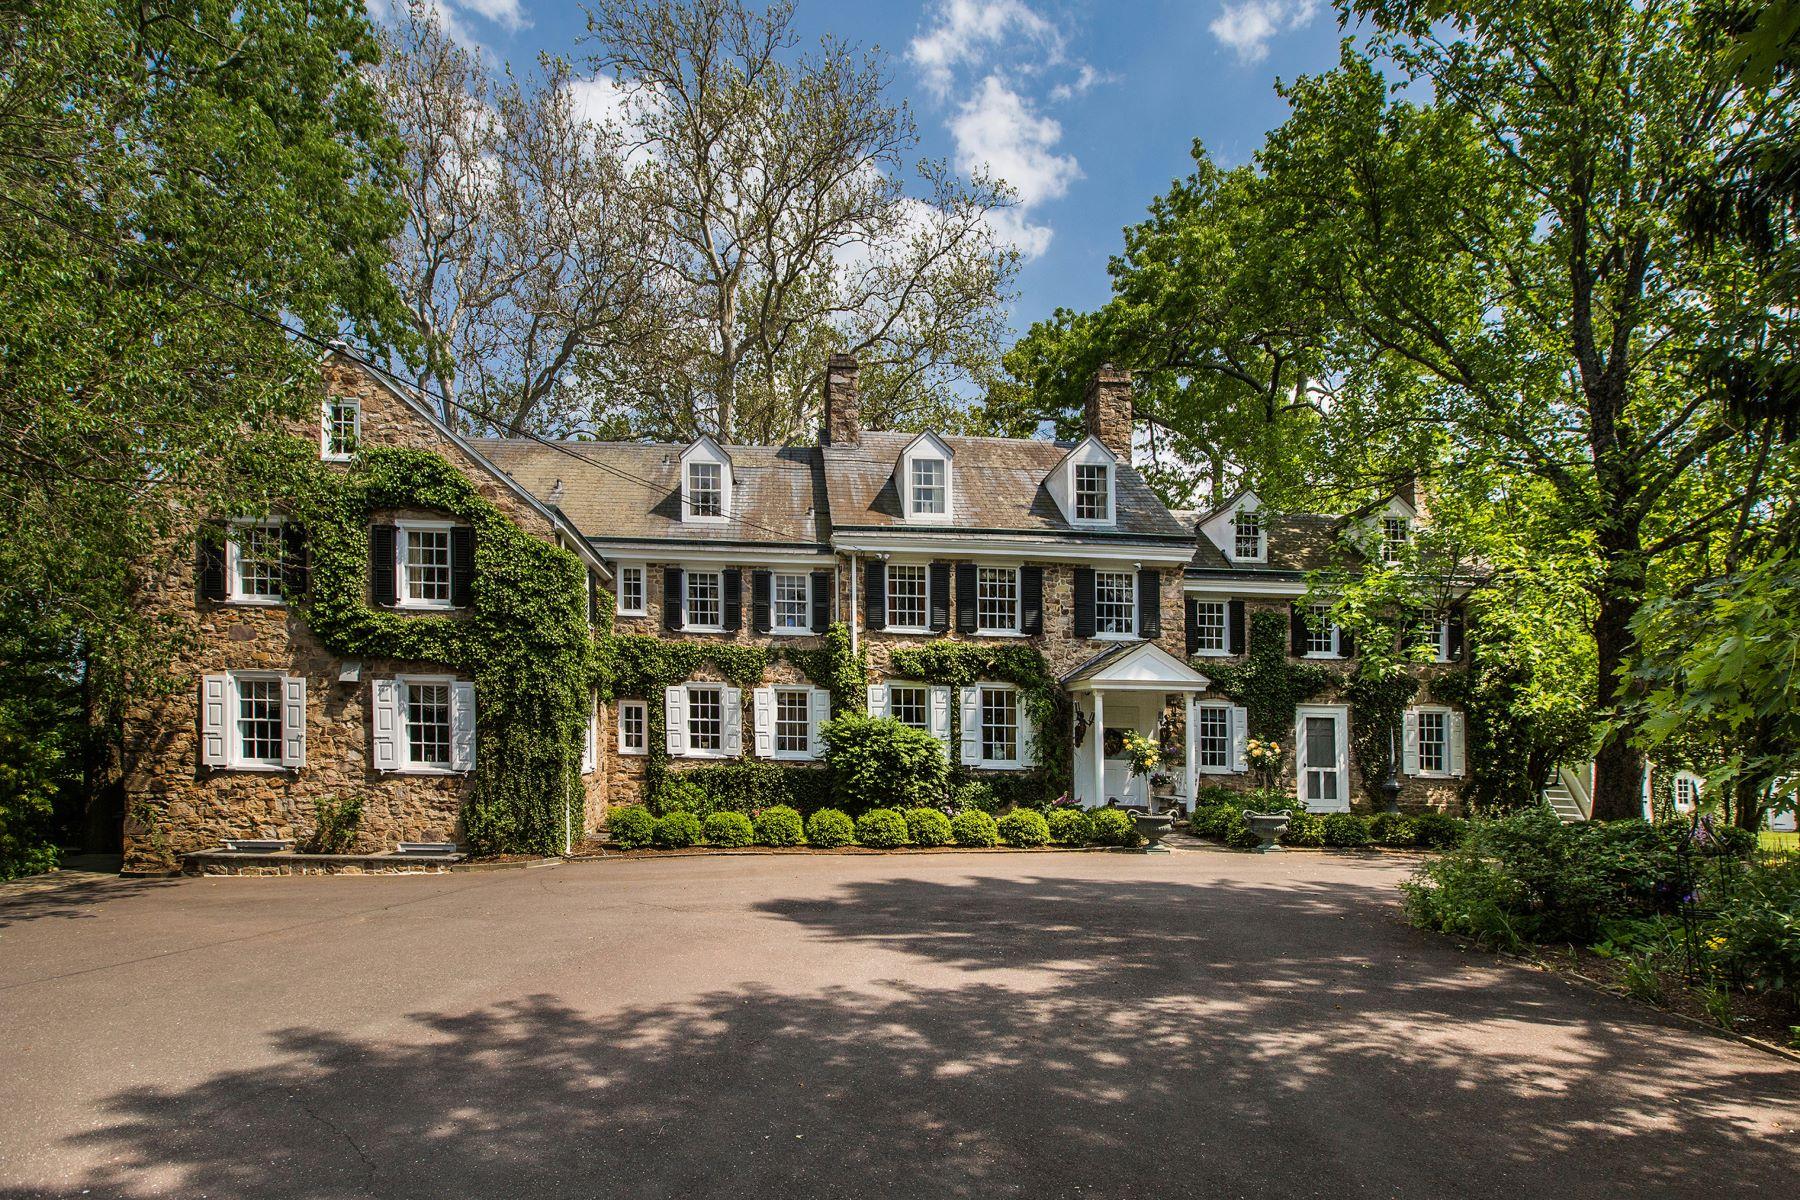 Single Family Homes για την Πώληση στο Elm Grove Farm 5453 YORK RD, New Hope, Πενσιλβανια 18938 Ηνωμένες Πολιτείες